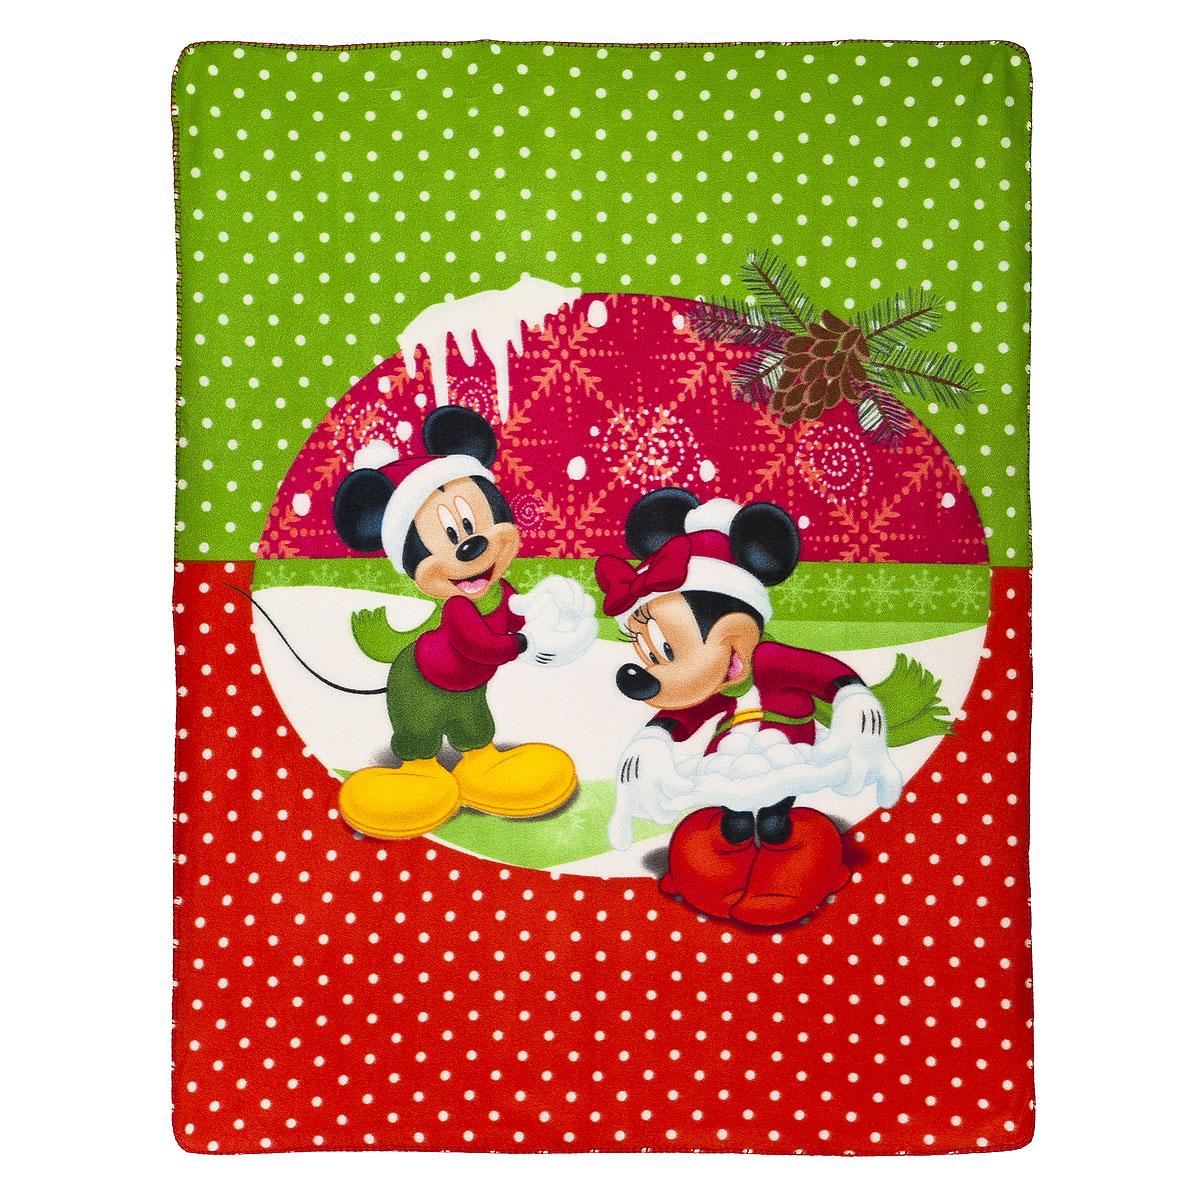 "Плед флисовый новогодний Disney ""Микки и Минни"", 130 х 160 см 65554"